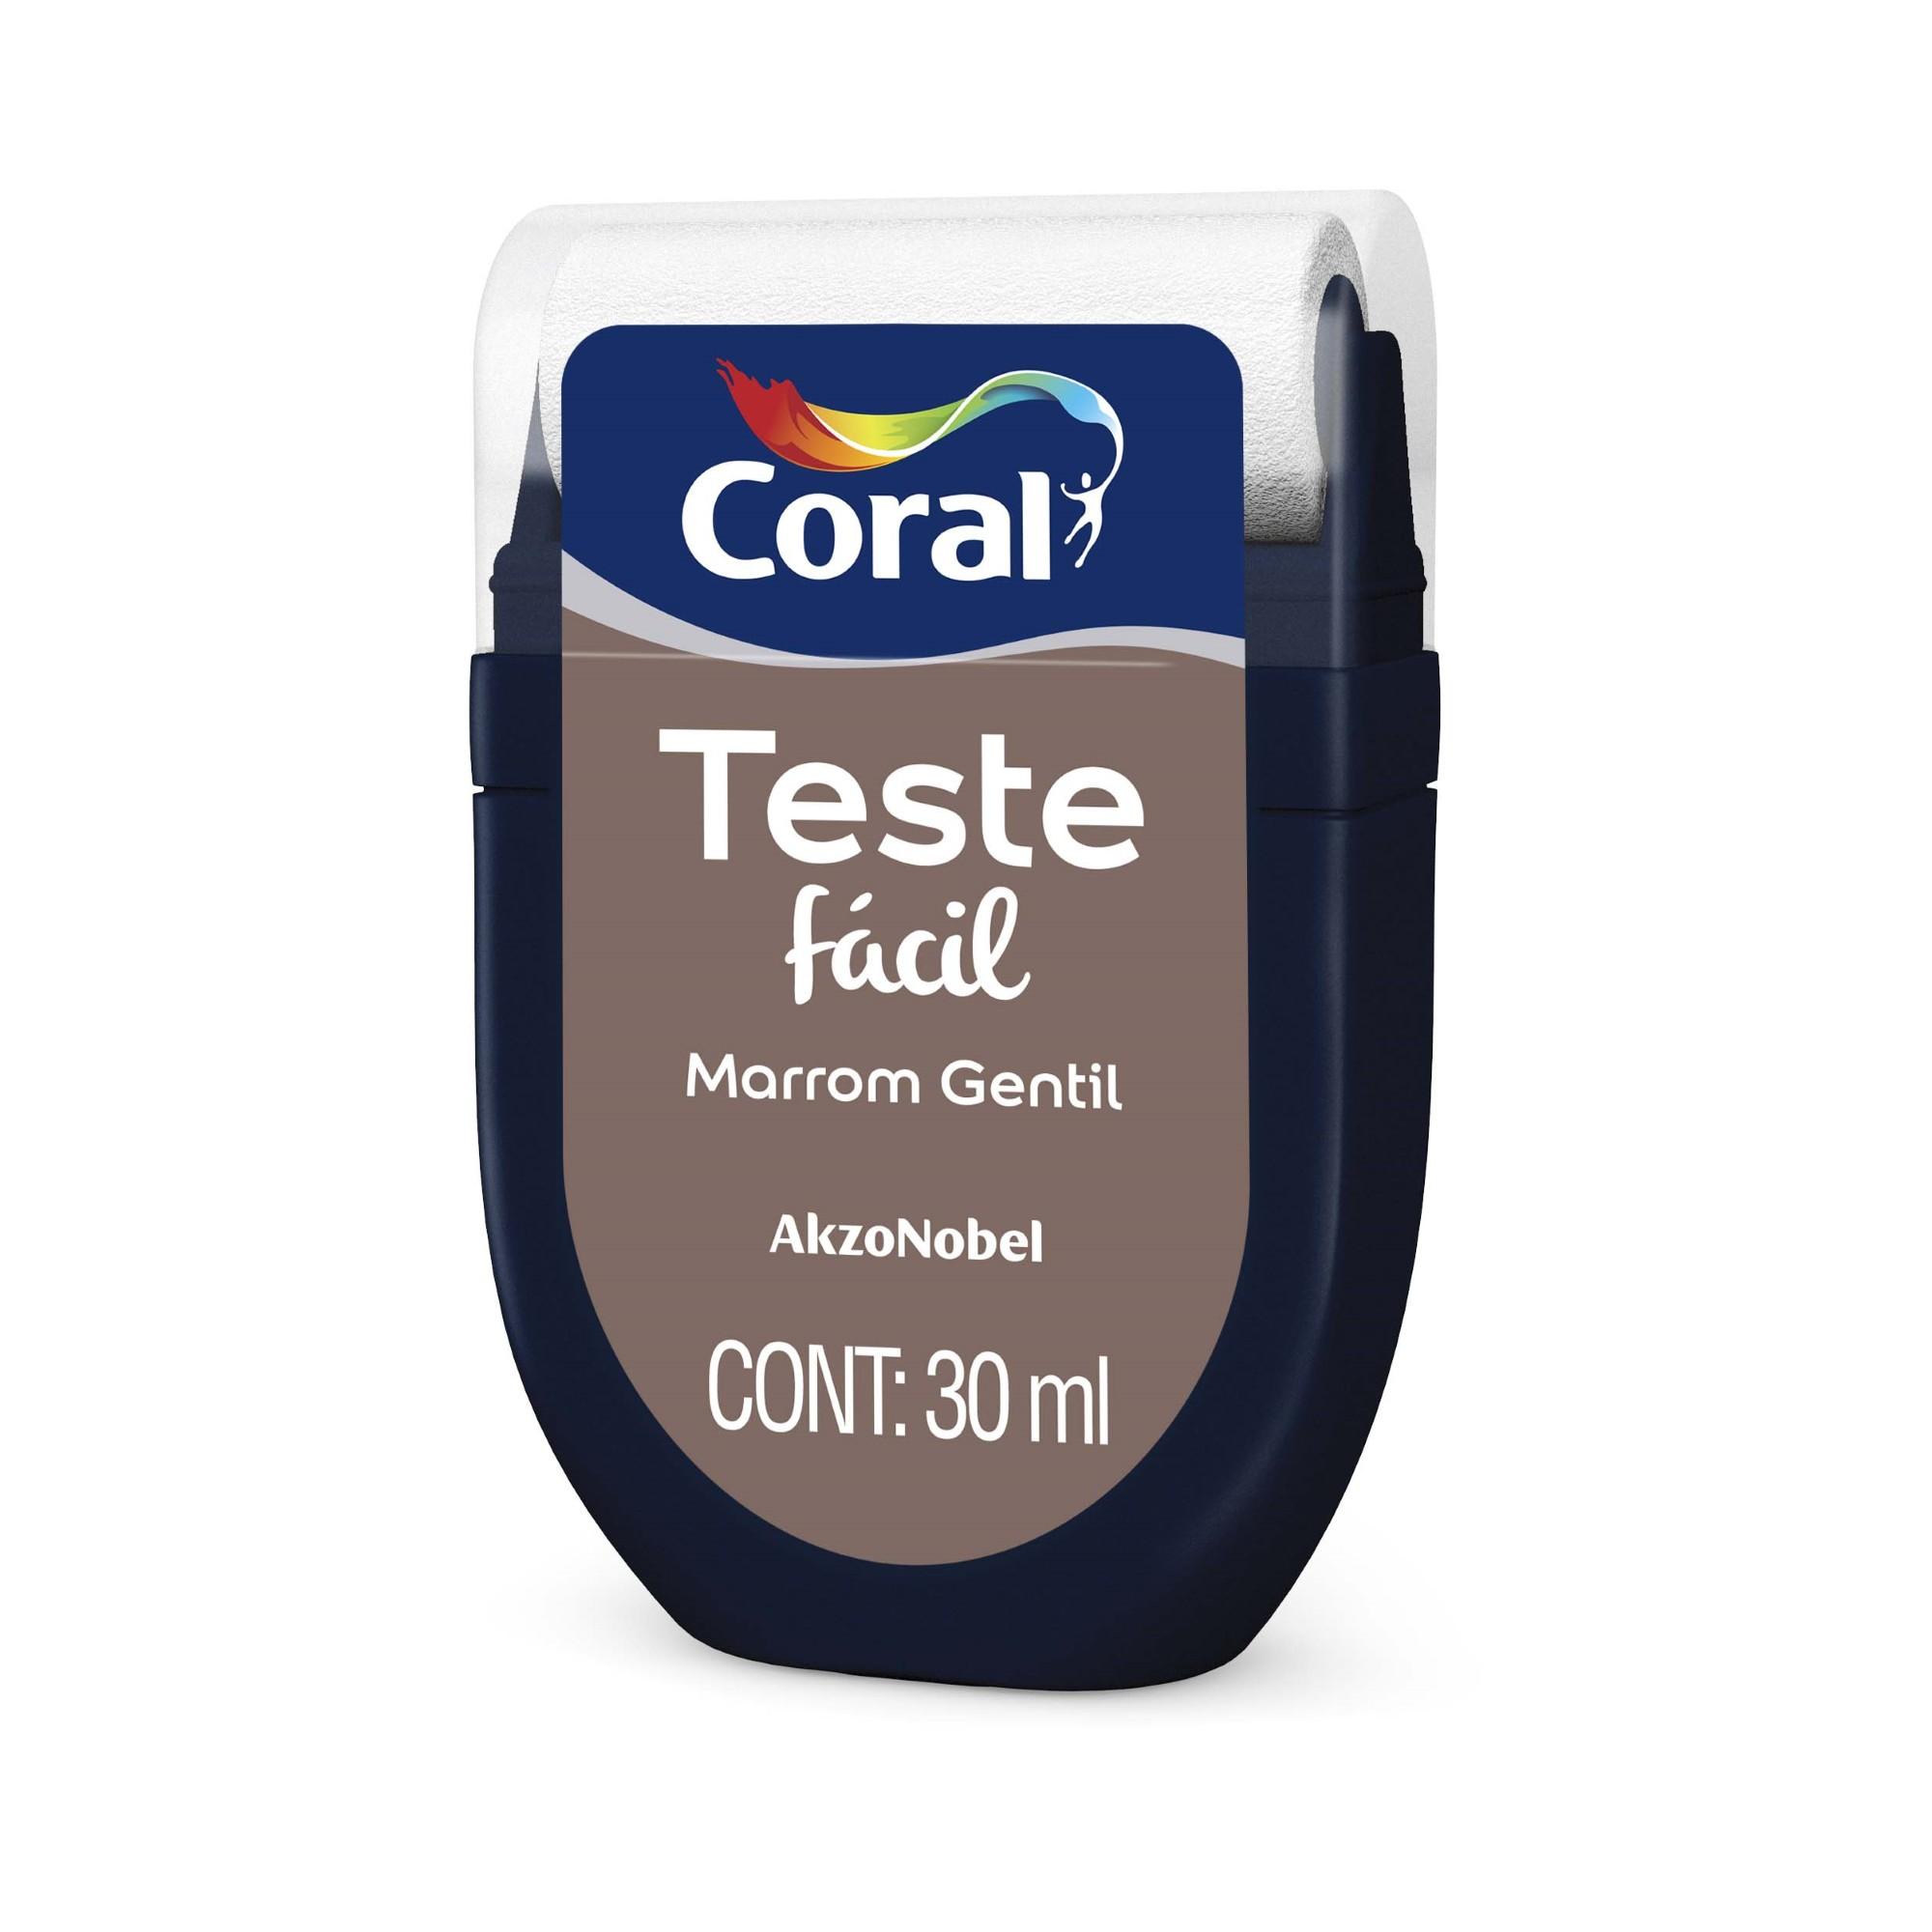 Teste Facil Marrom Gentil 30ml - Coral